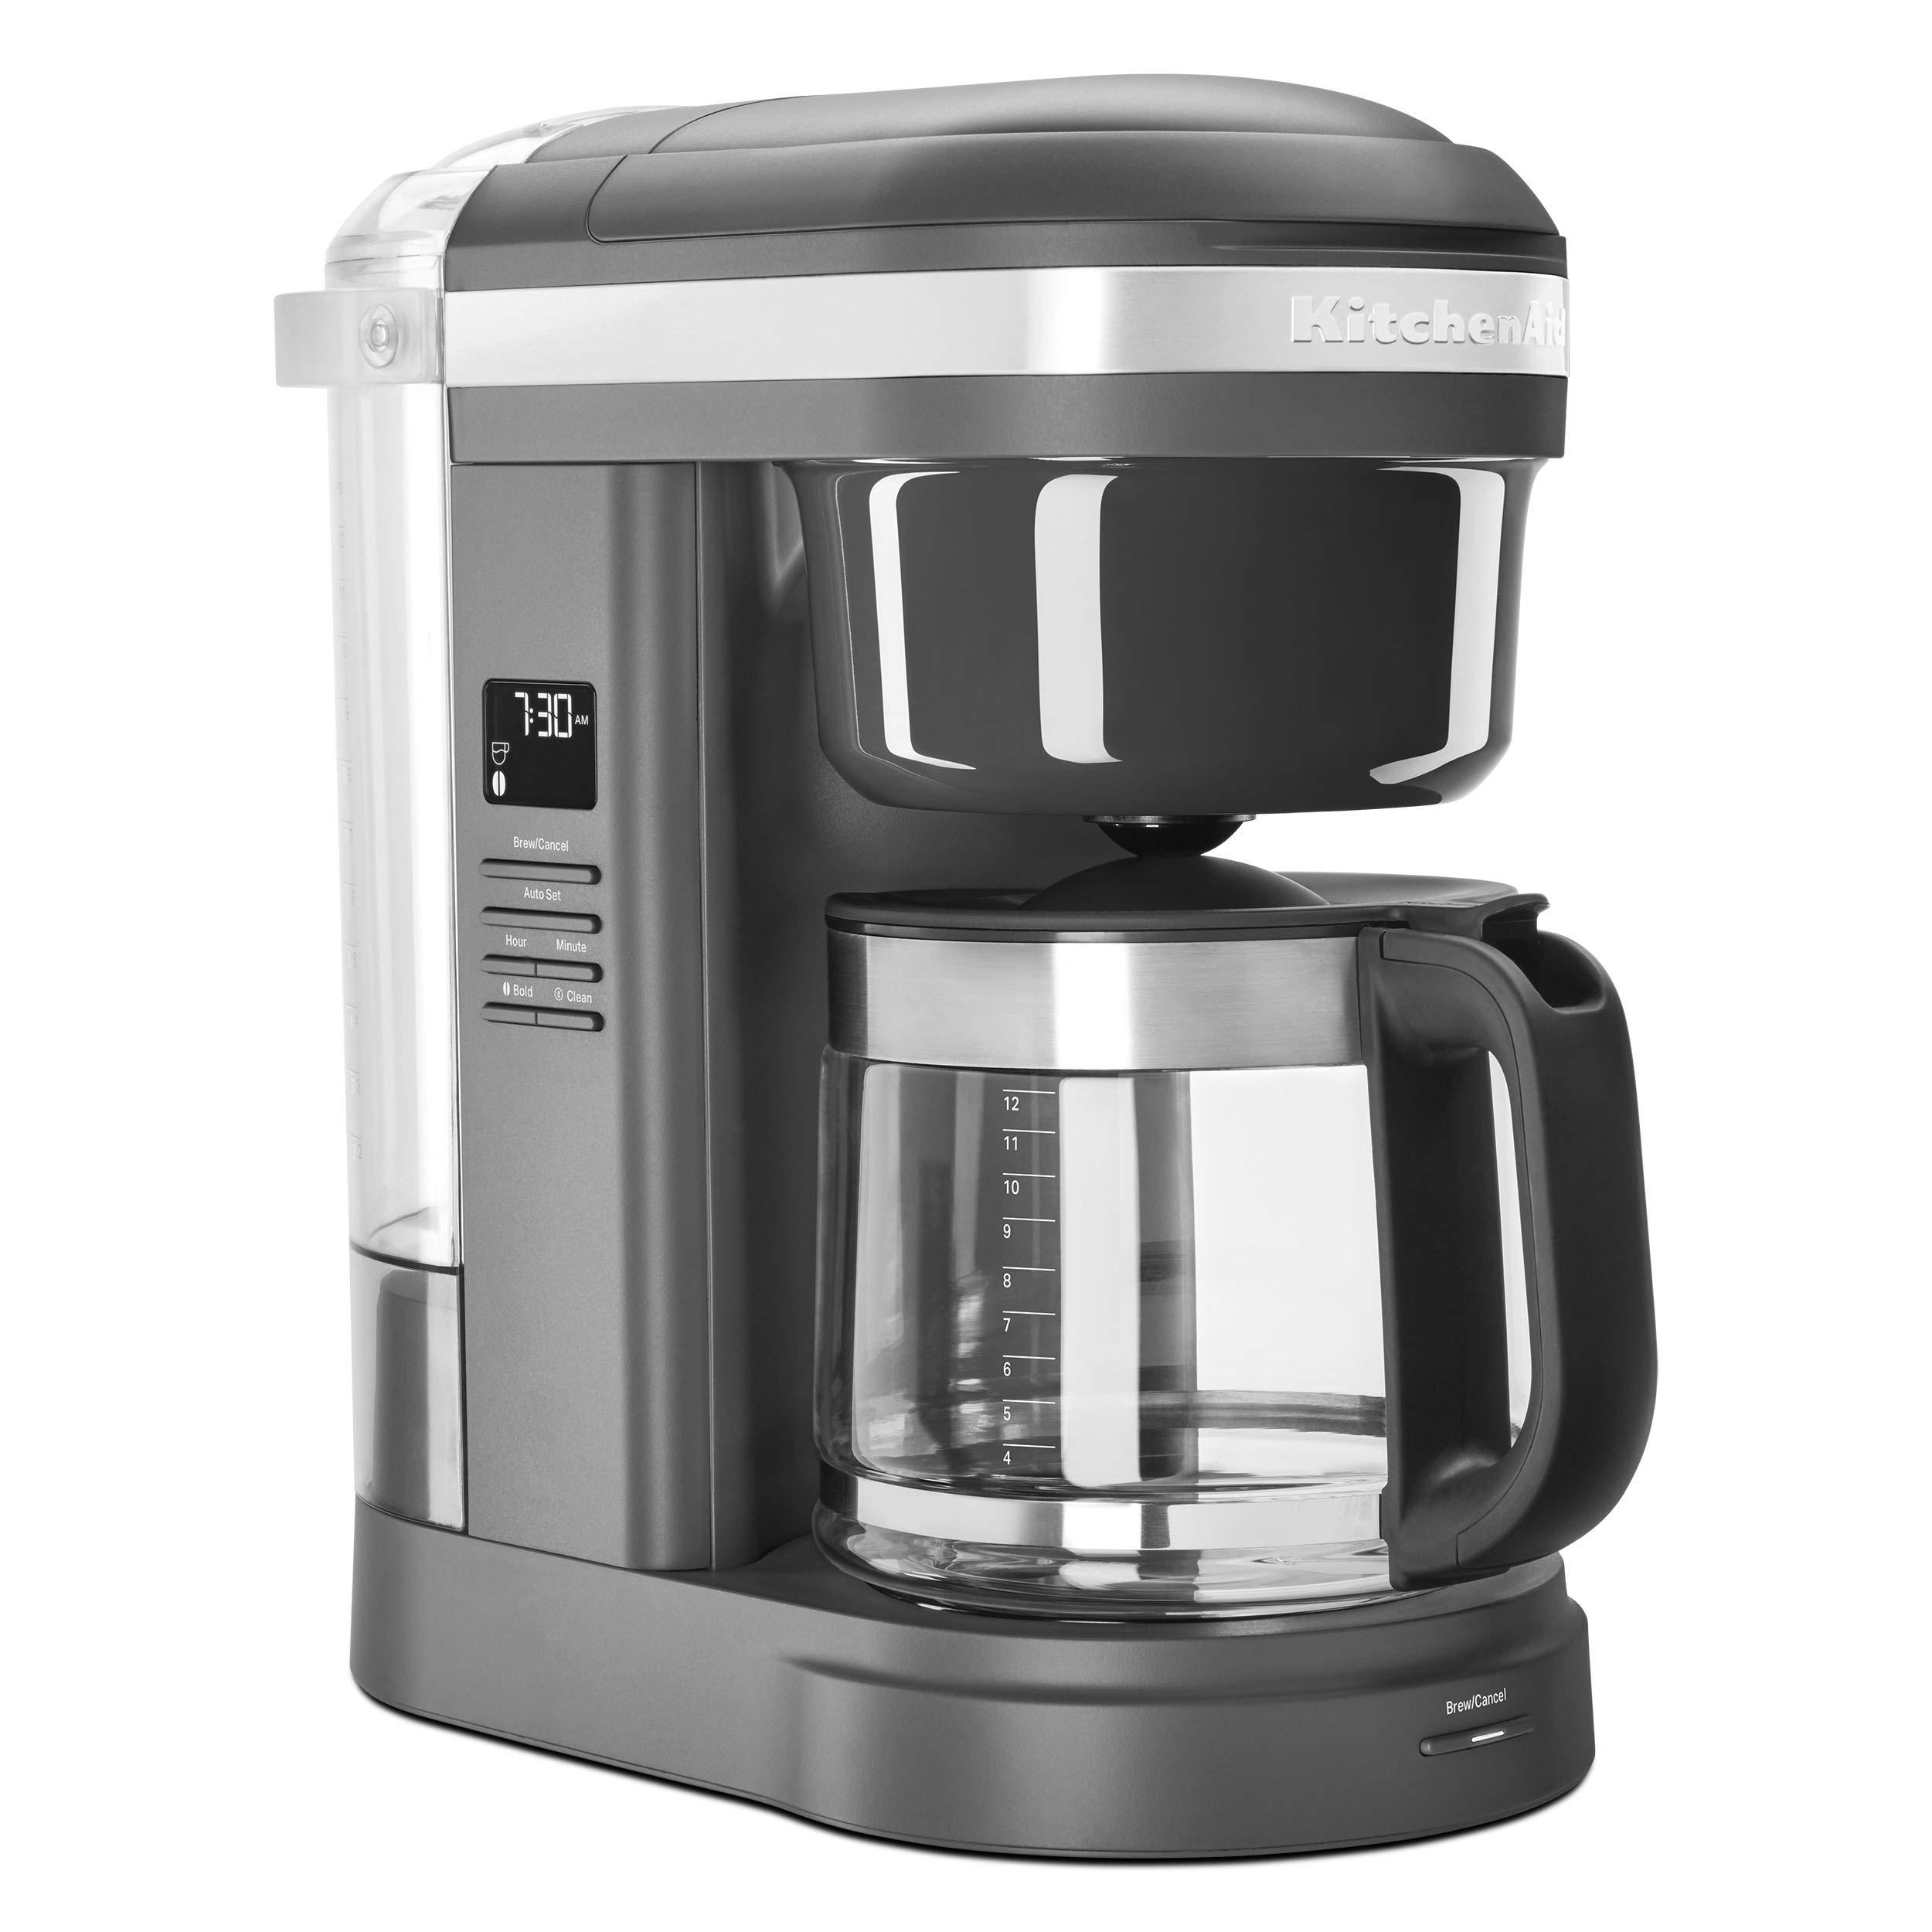 KitchenAid KCM1208DG Spiral Showerhead 12 Cup Drip Coffee Maker, Matte Charcoal Grey by KitchenAid